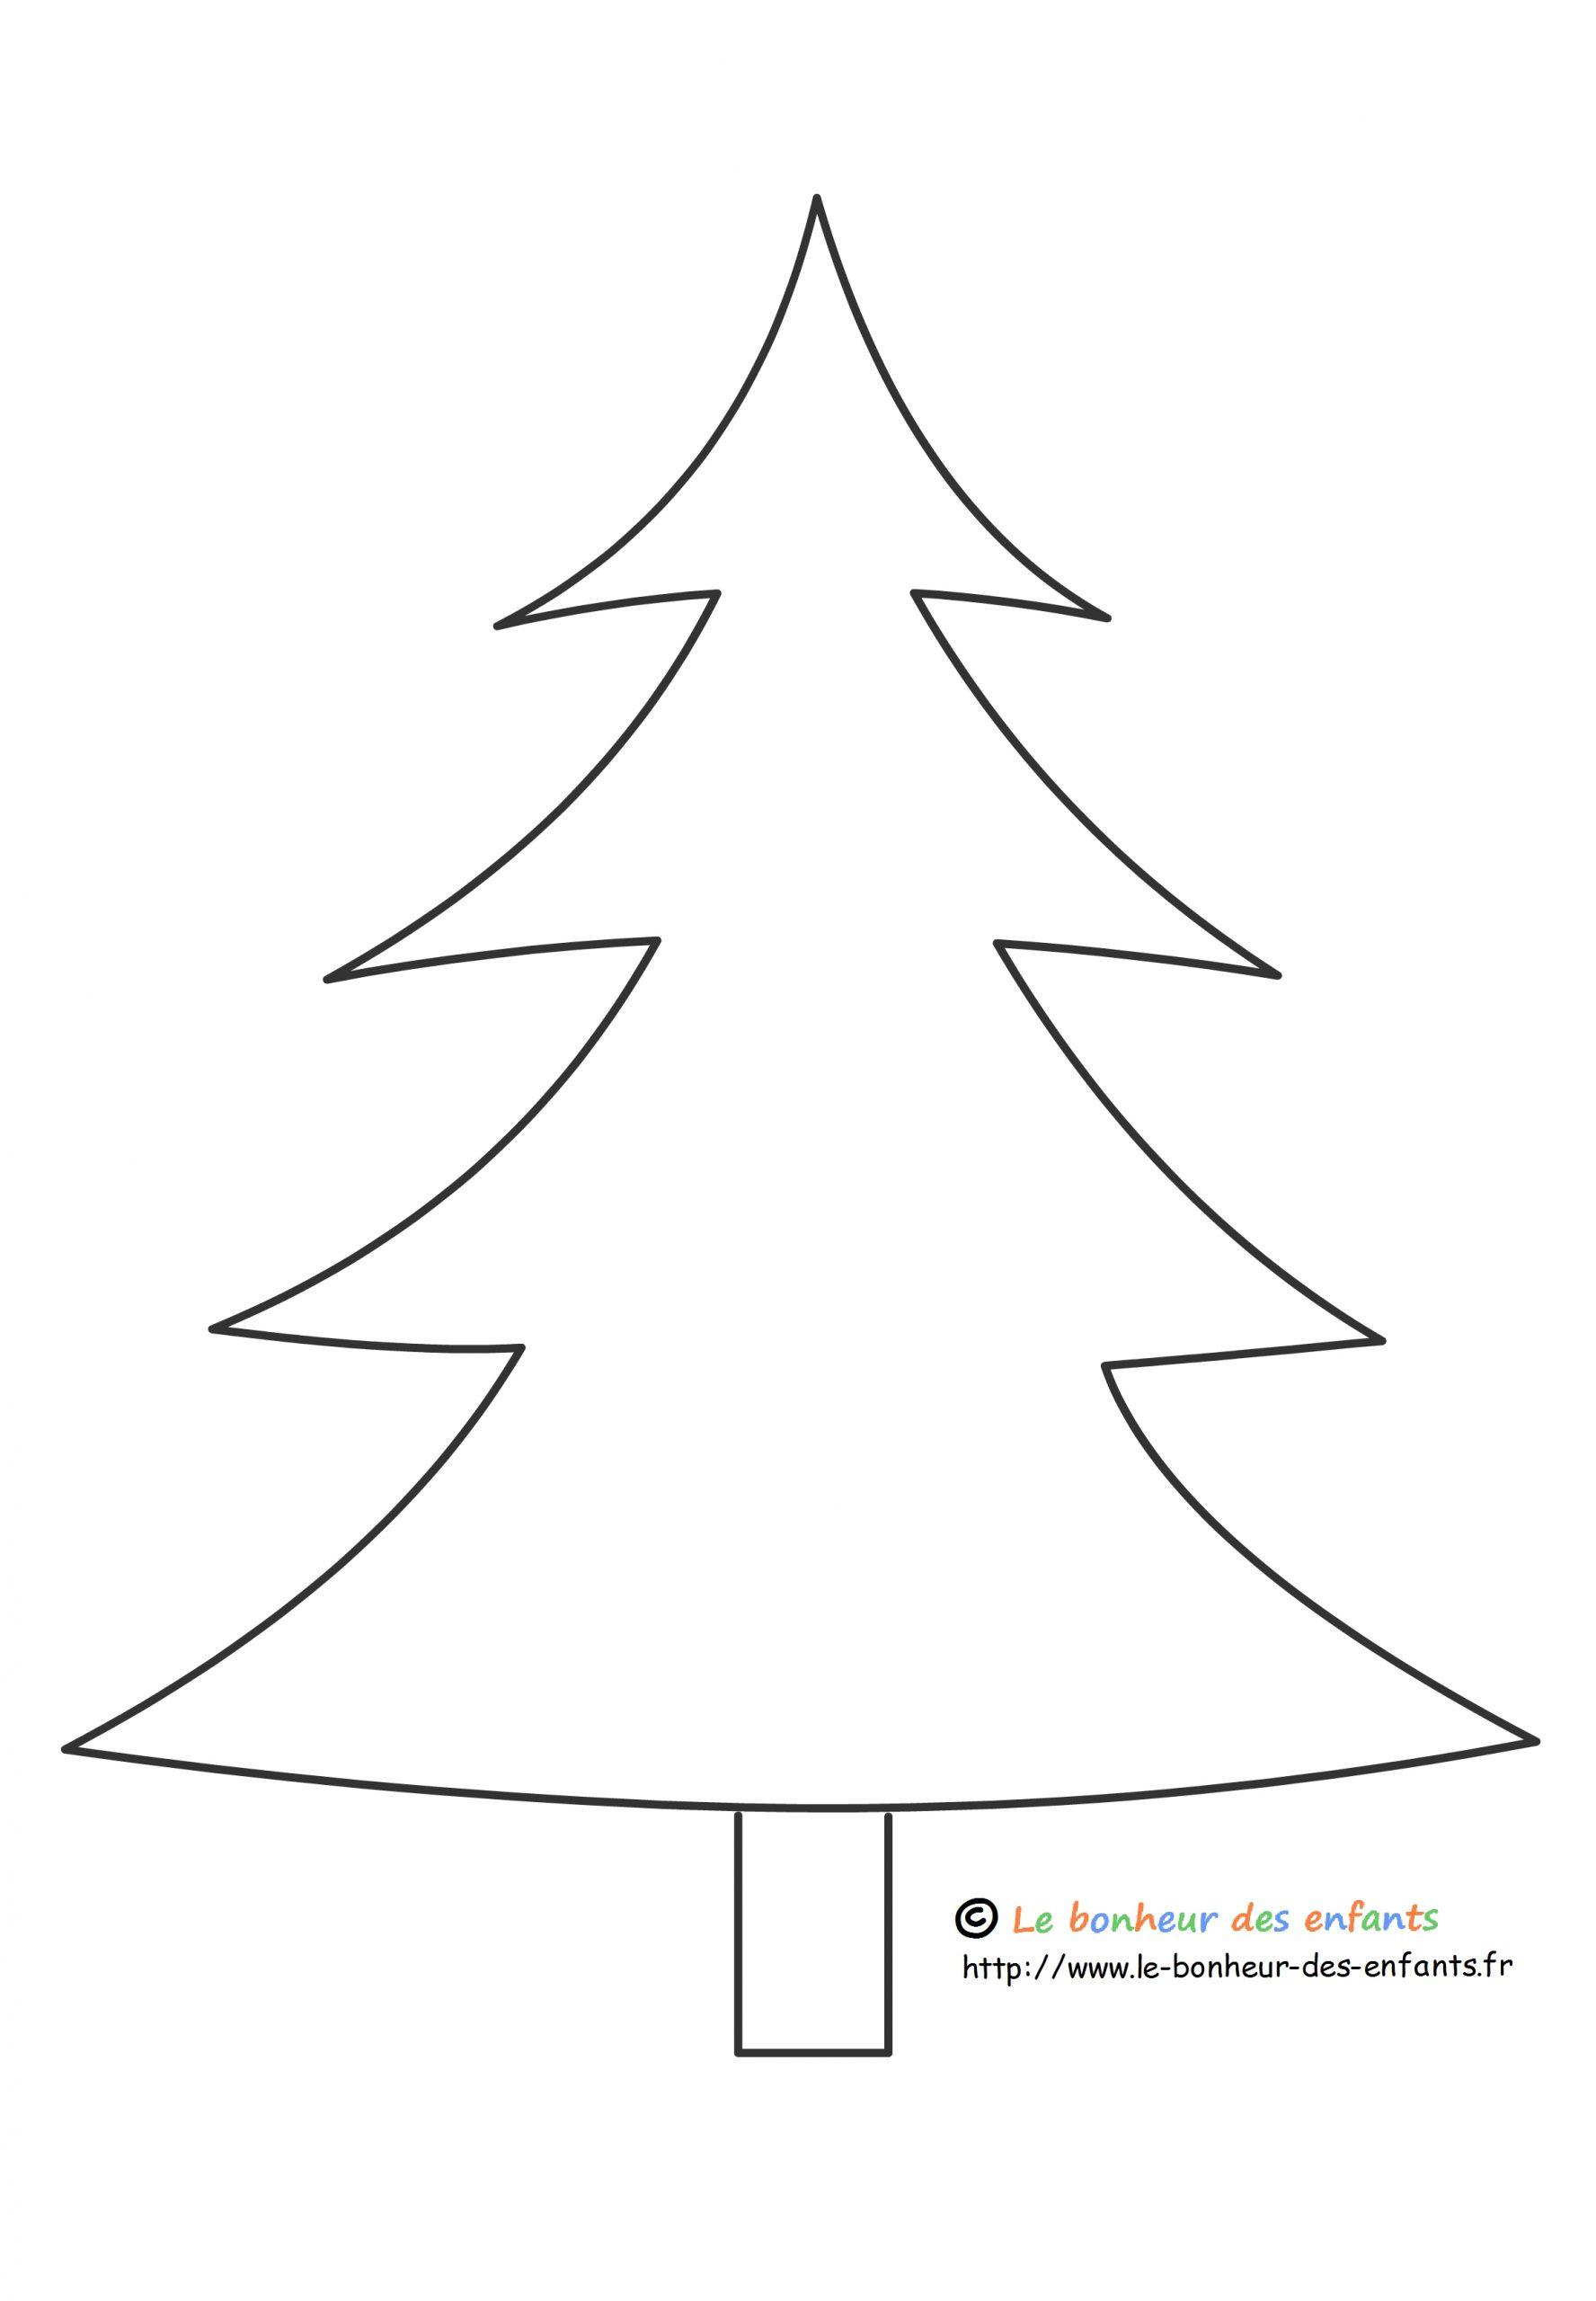 Coloriage Gabarit De Sapin Noël Dessin Gratuit Imprimer tout Gabarit Sapin De Noel A Imprimer